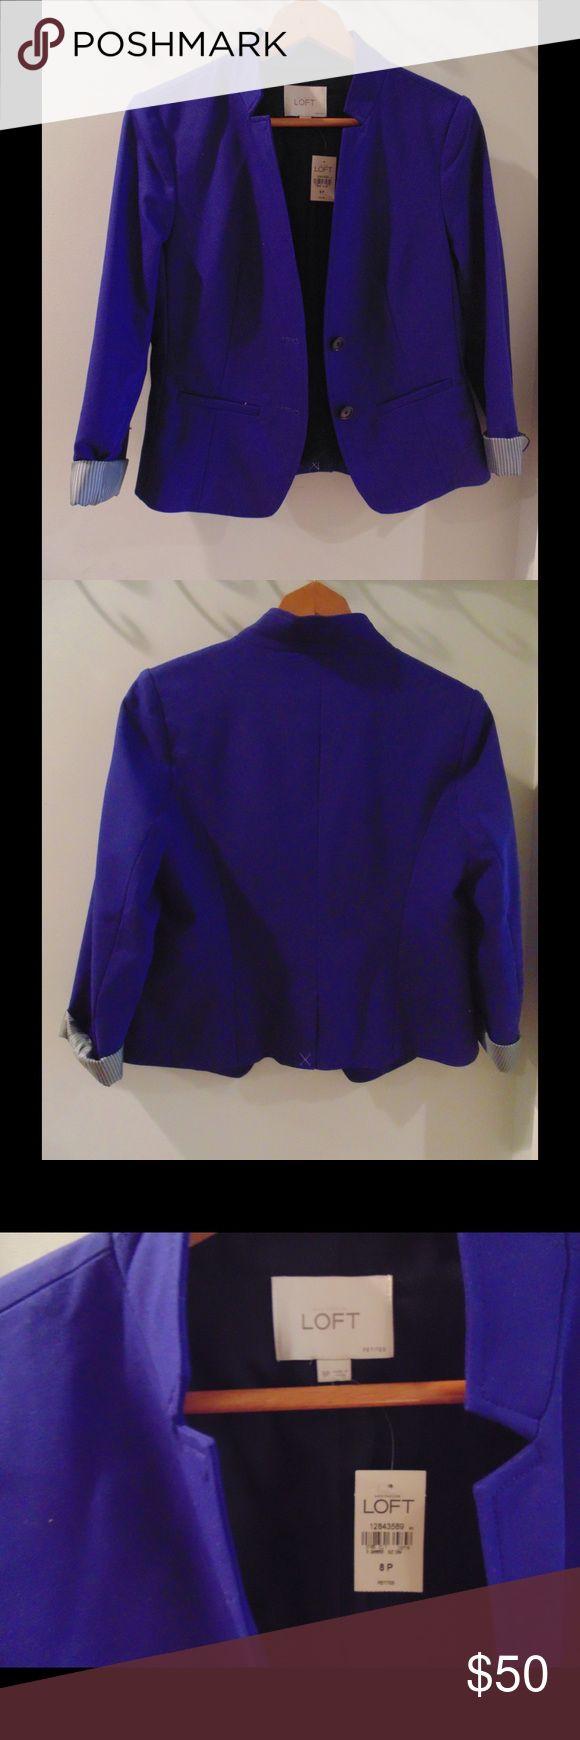 Royal Blue Blazer New with tags - royal blue blazer from Ann Taylor LOFT. LOFT Jackets & Coats Blazers